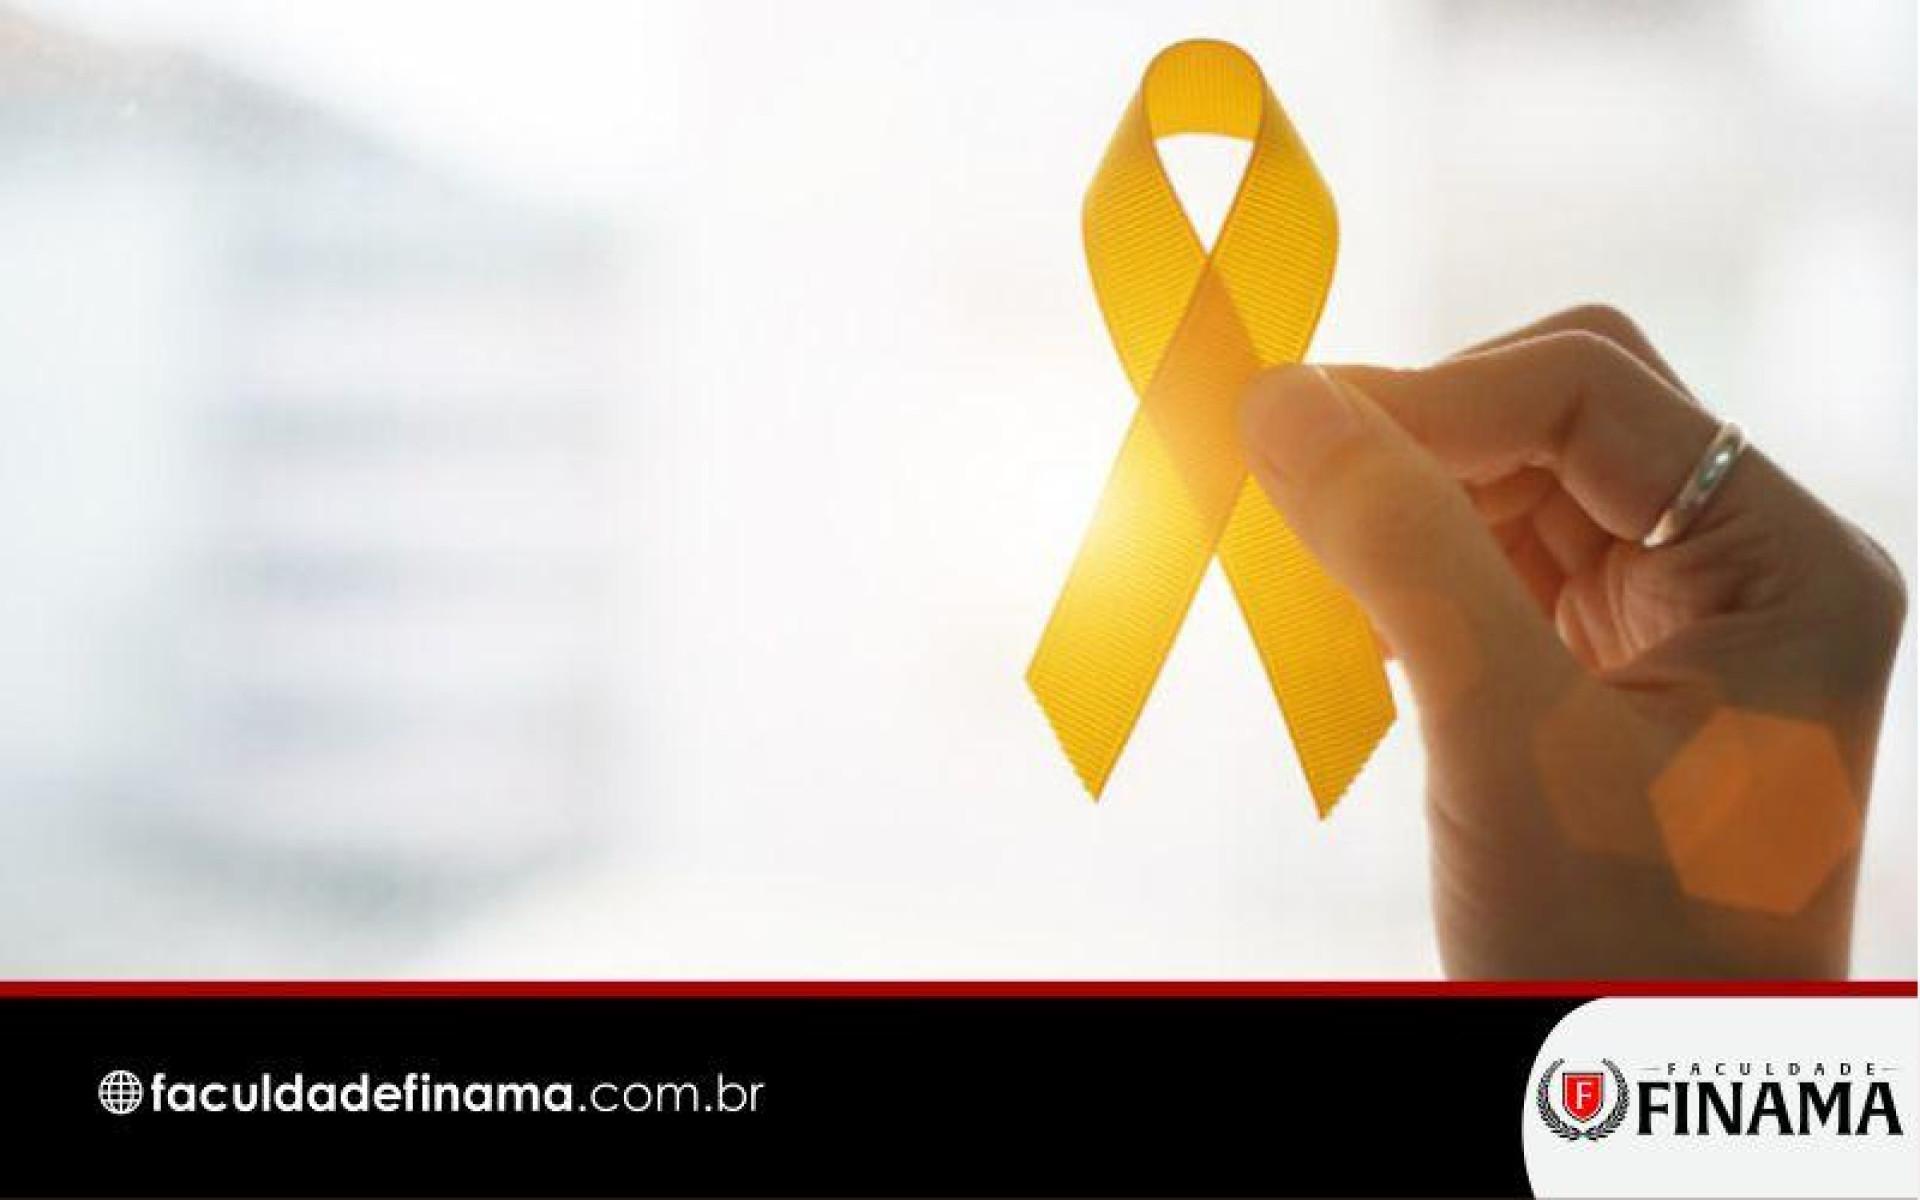 Setembro Amarelo e a saúde mental dos trabalhadores